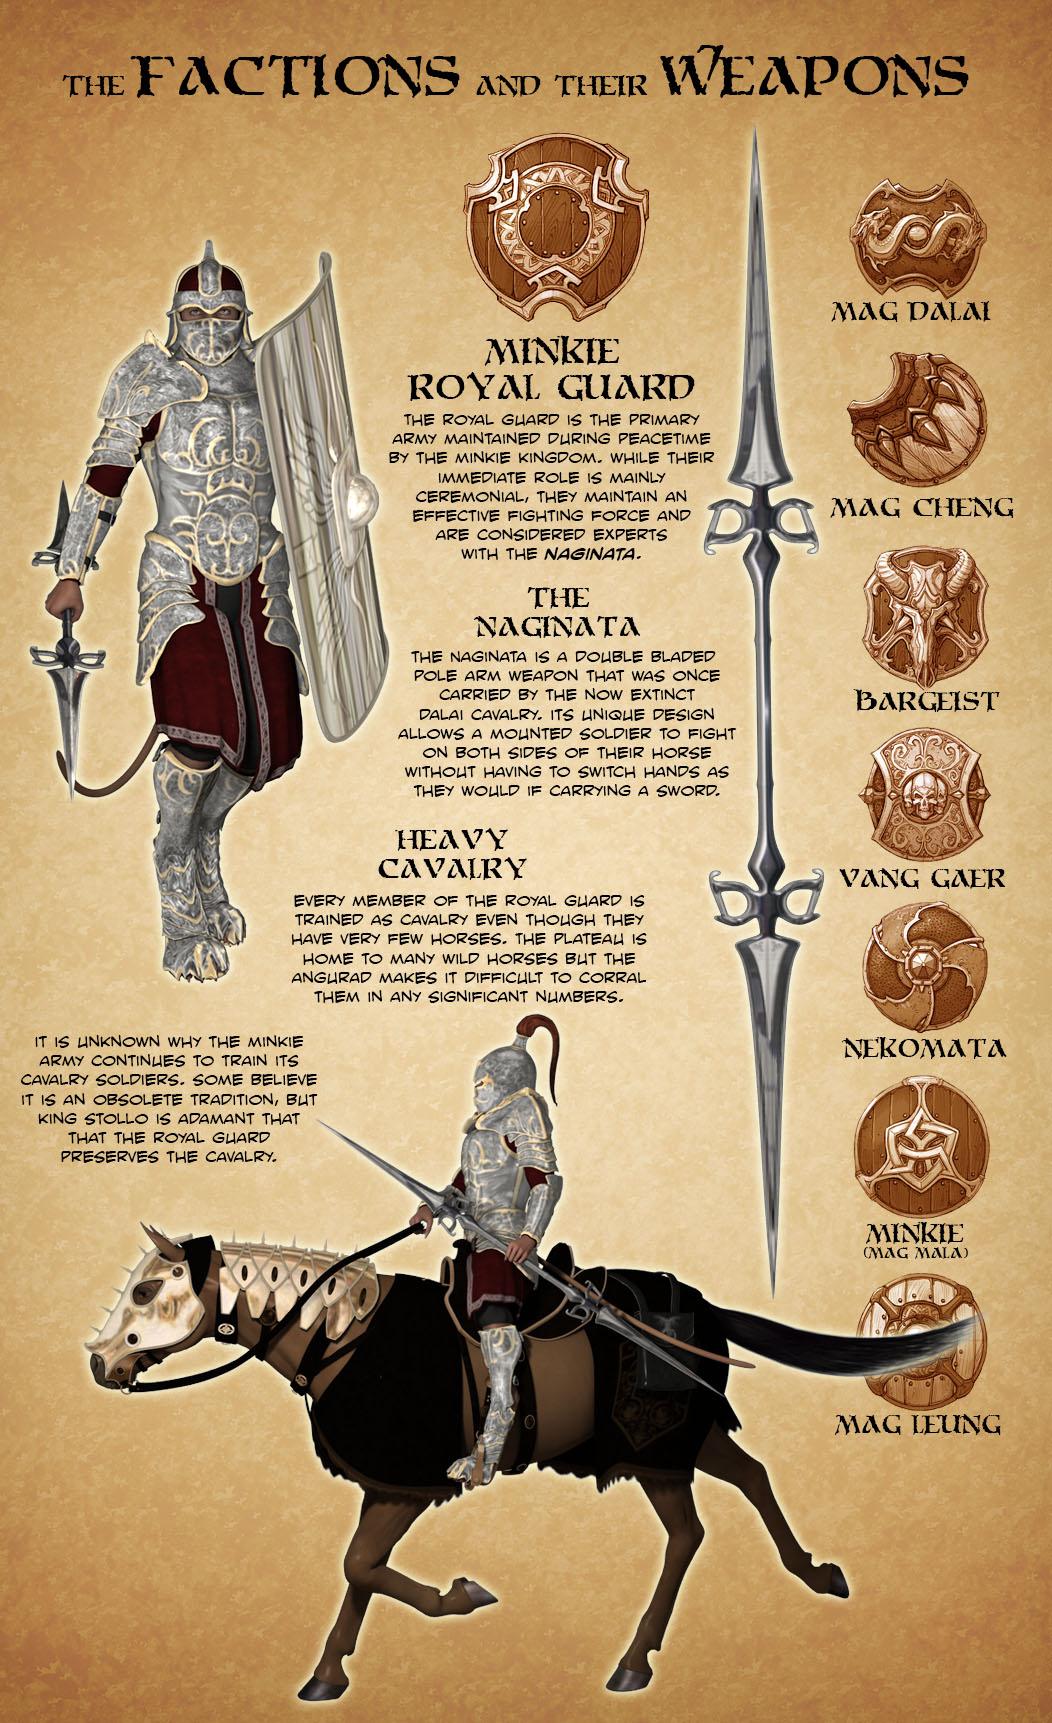 Minkie Royal Guard